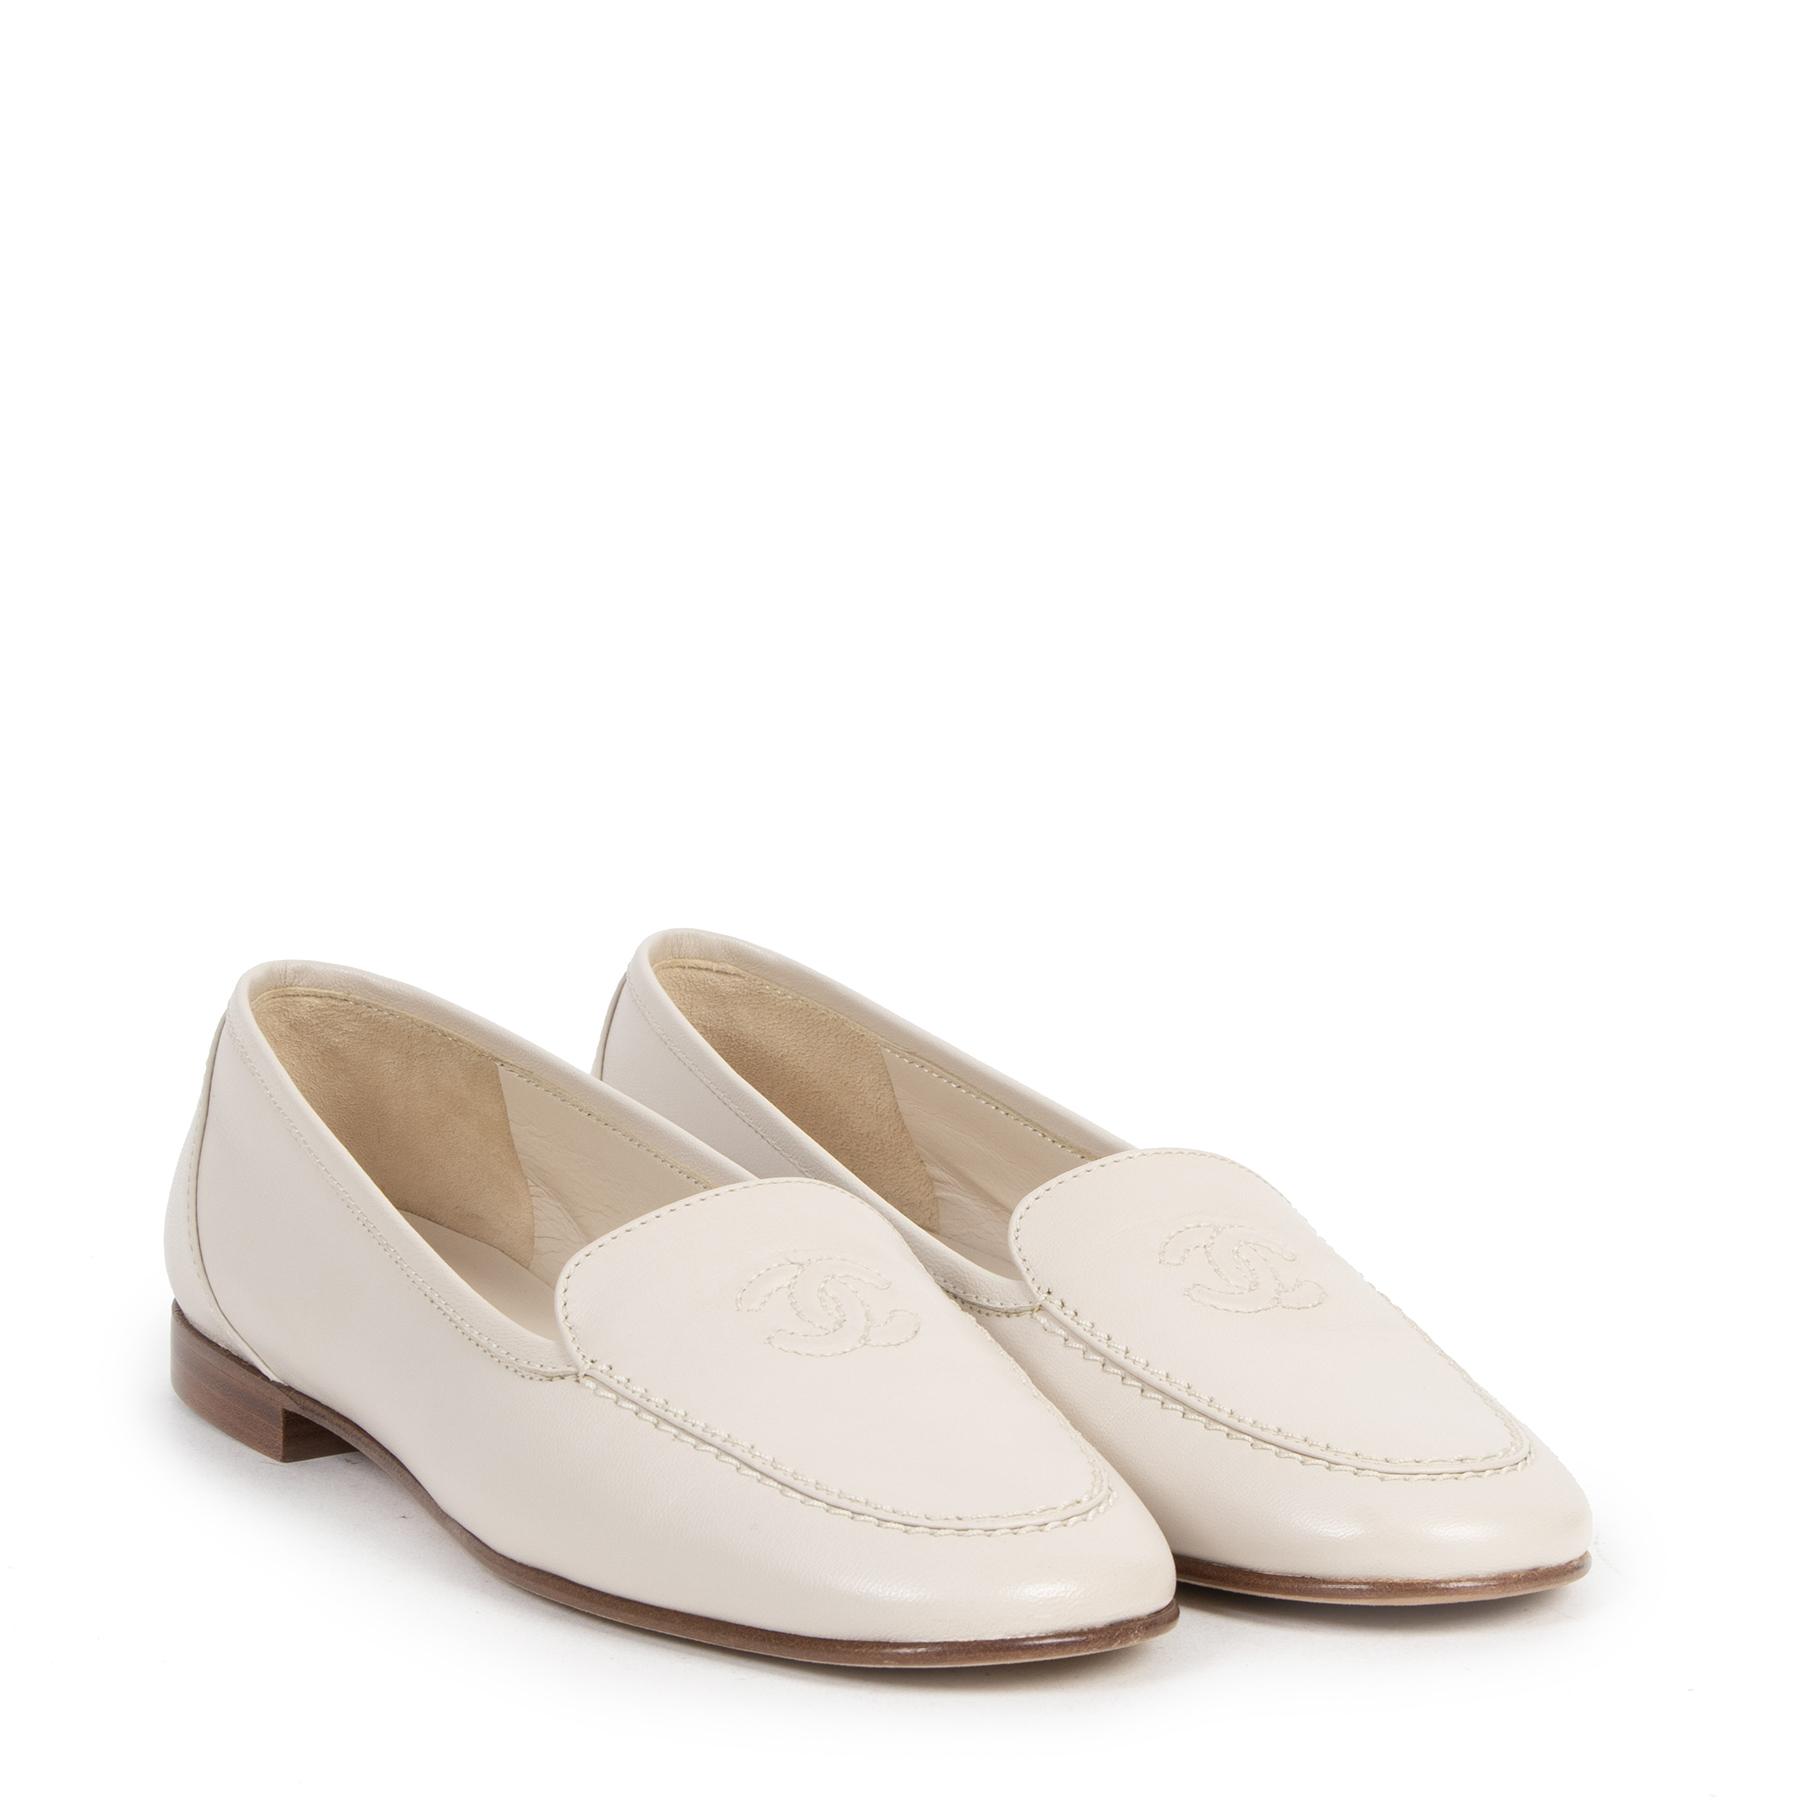 Authentieke tweedehands vintage Chanel Beige CC Loafers - Size 36 koop online webshop LabelLOV